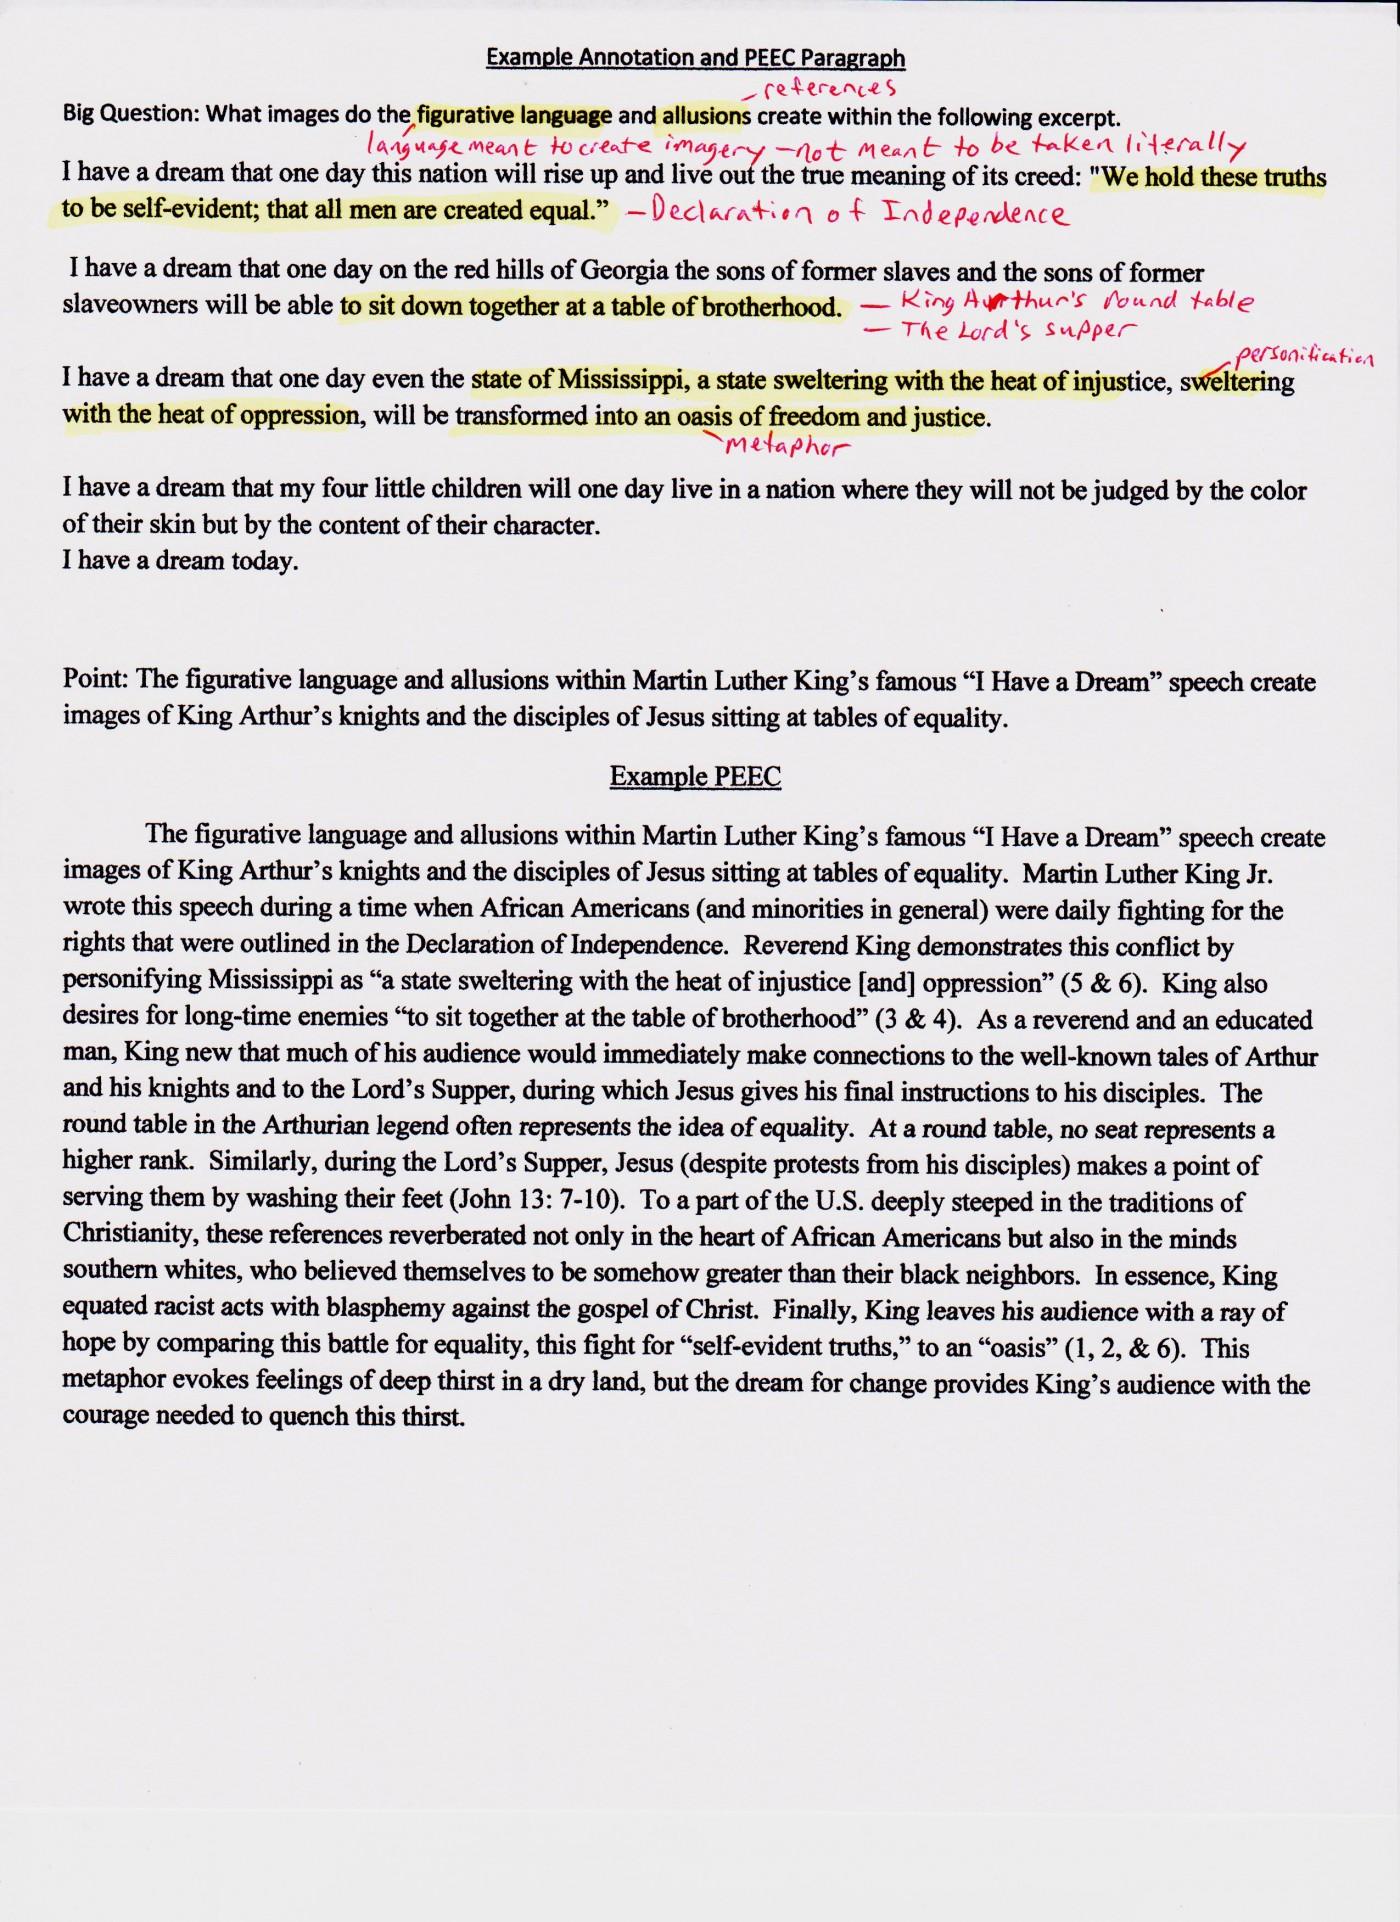 008 Example20annotation20and20plea20001 Essay Example Njhs Unique Conclusion 1400